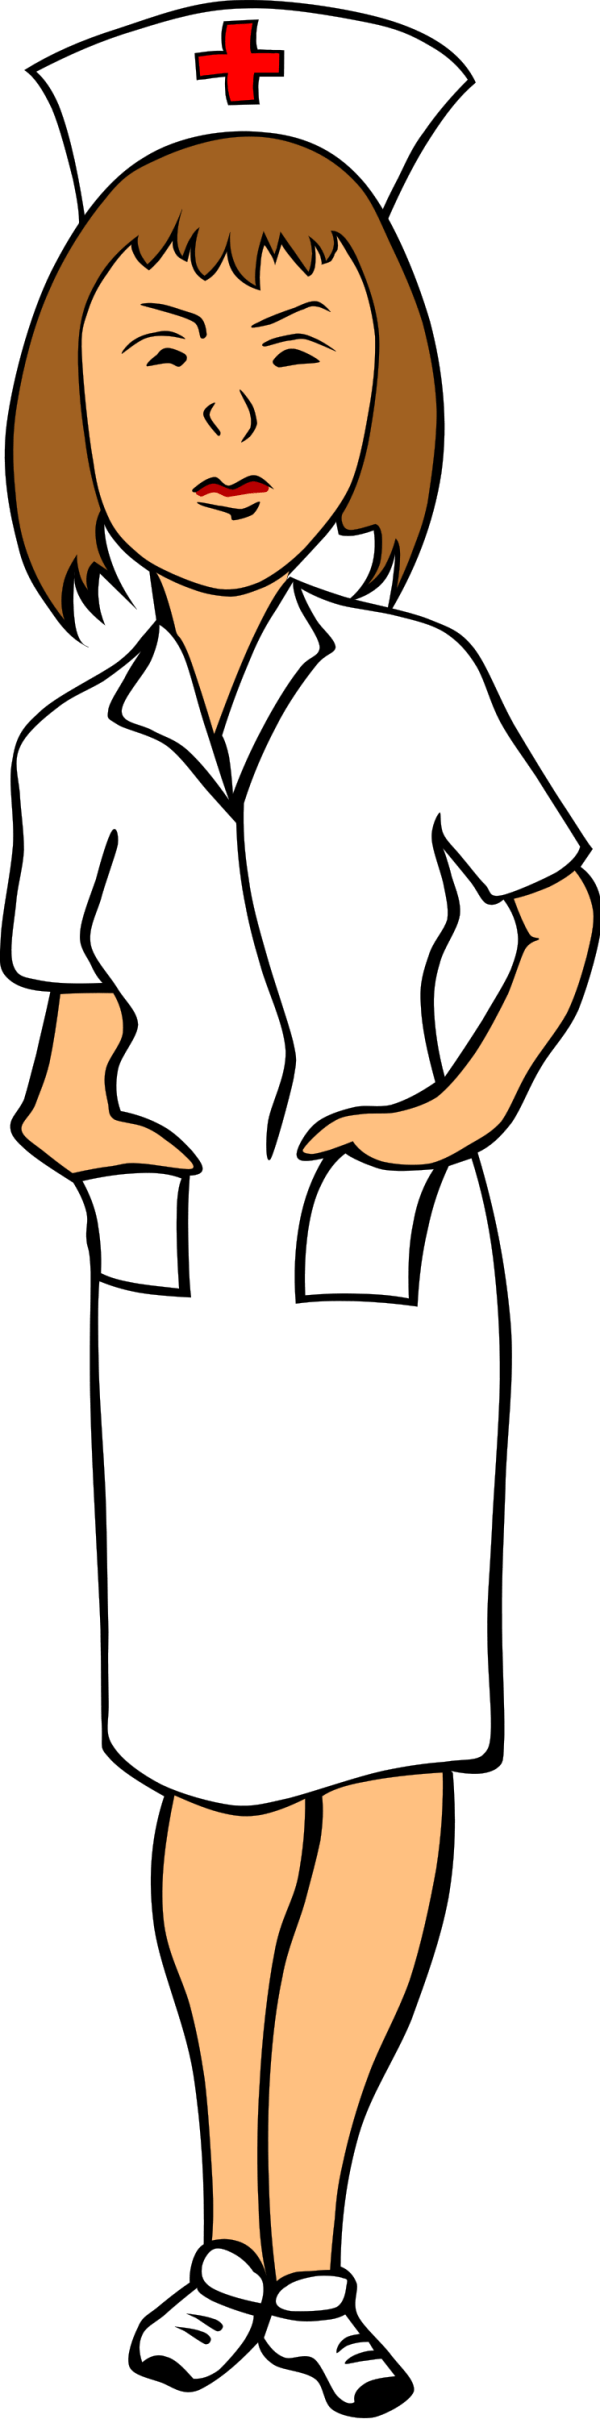 nurse free stock illustration